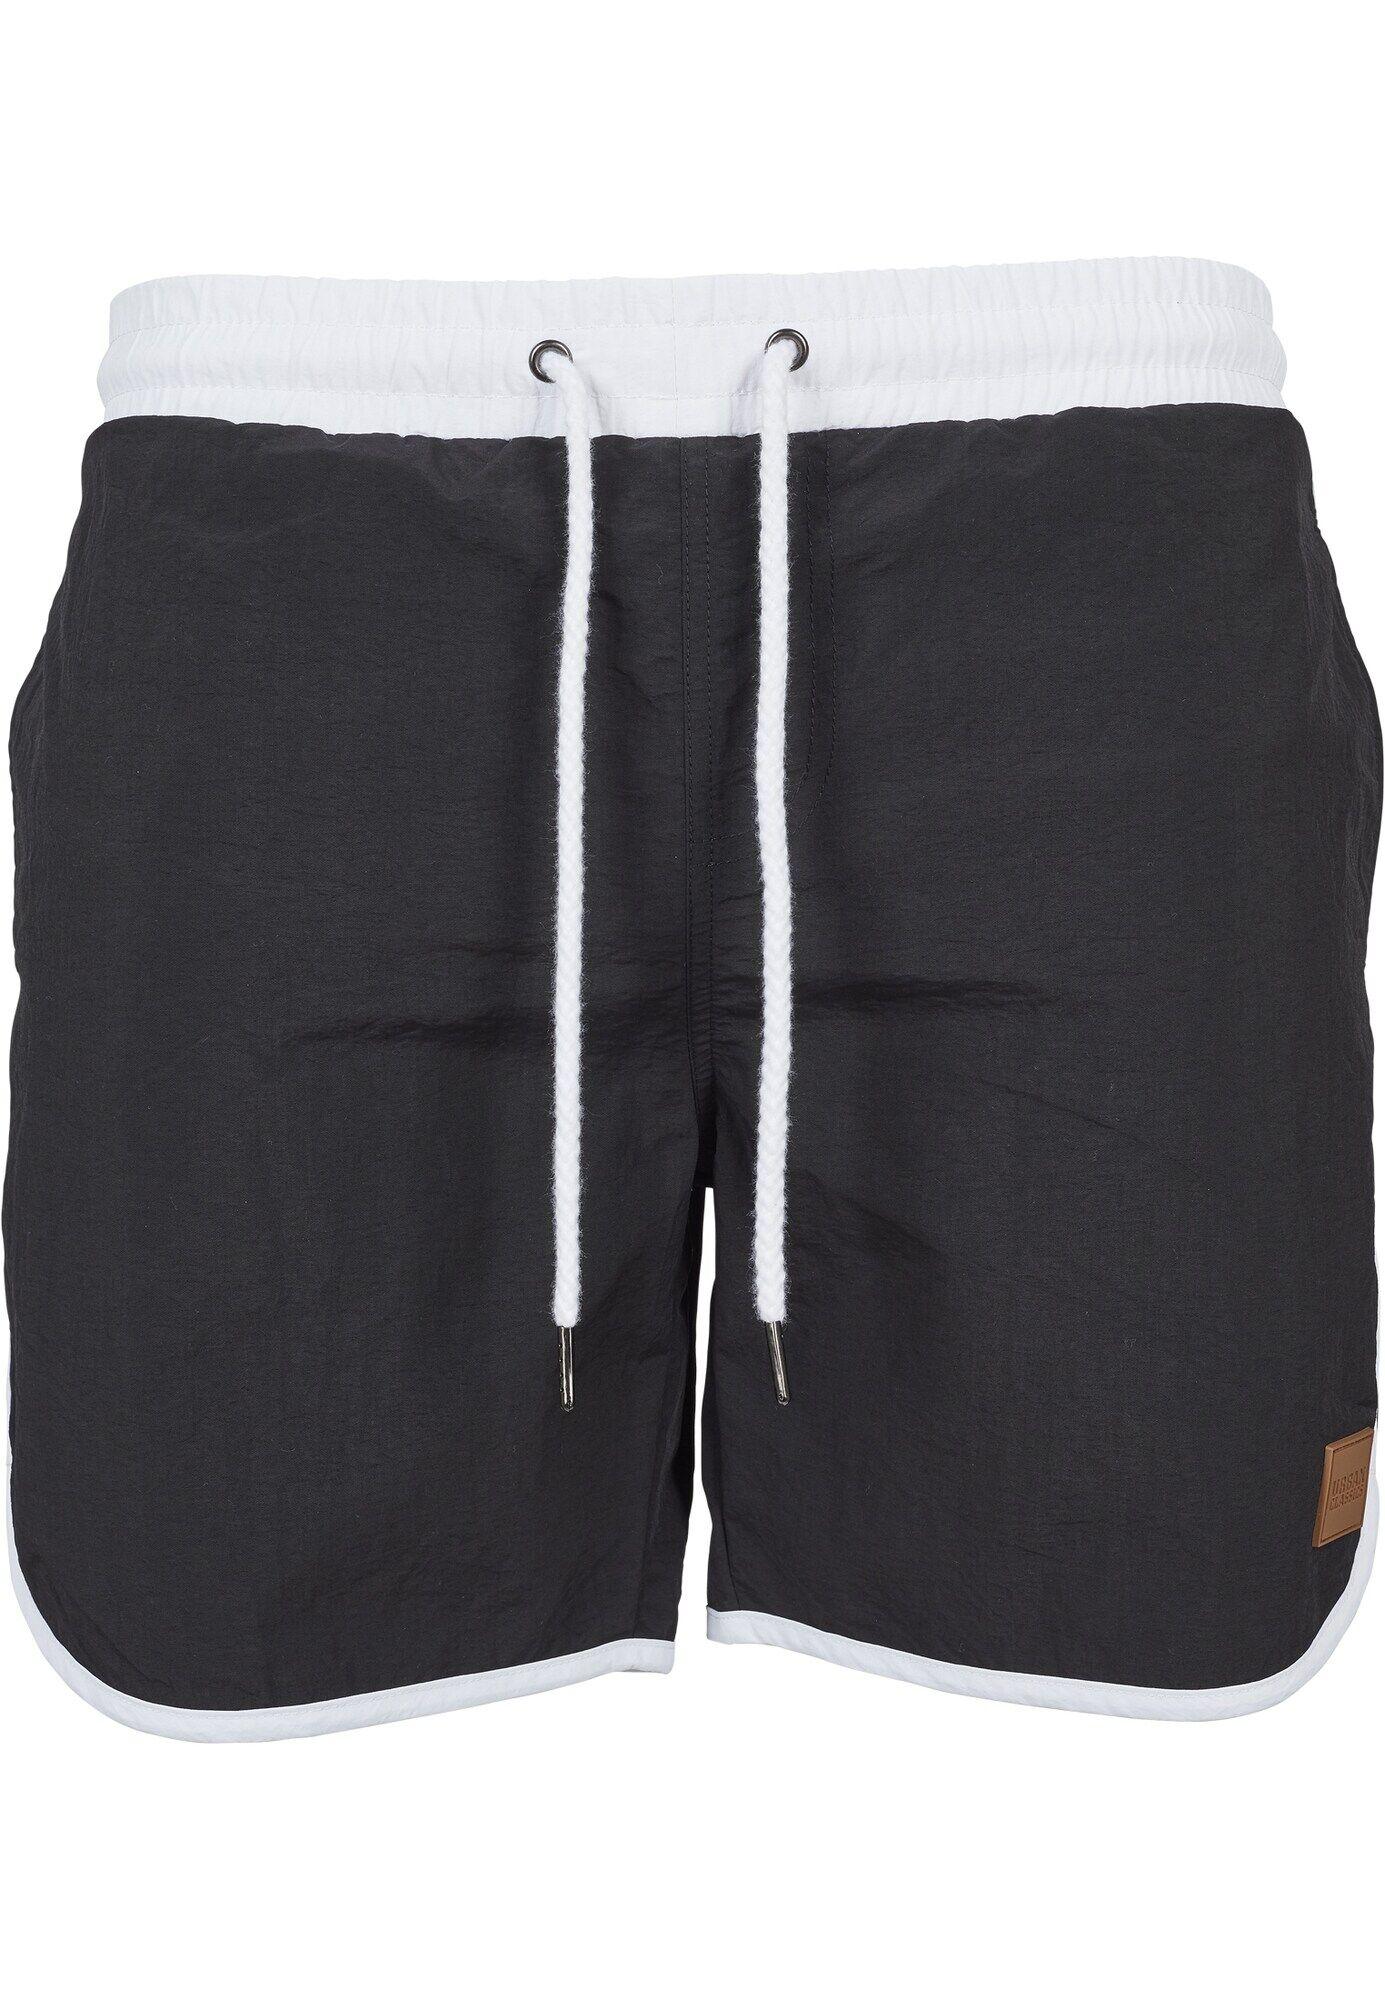 Urban Classics Shorts de bain  - Noir - Taille: XXXL - male